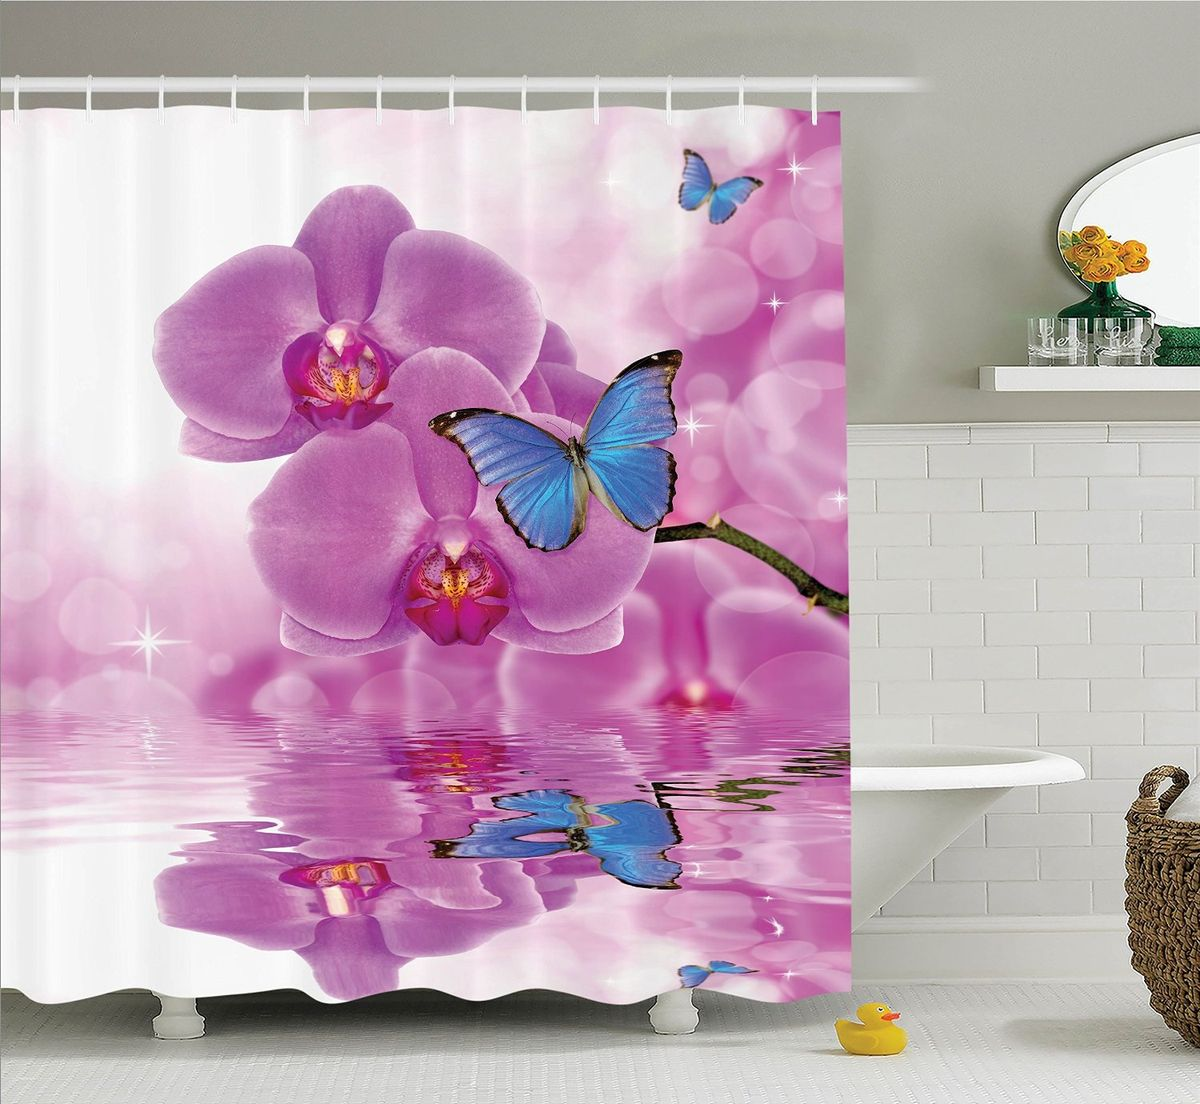 Штора для ванной комнаты Magic Lady Бабочки на цветах орхидеи, 180 х 200 см фотоштора для ванной утка принимает душ magic lady 180 х 200 см